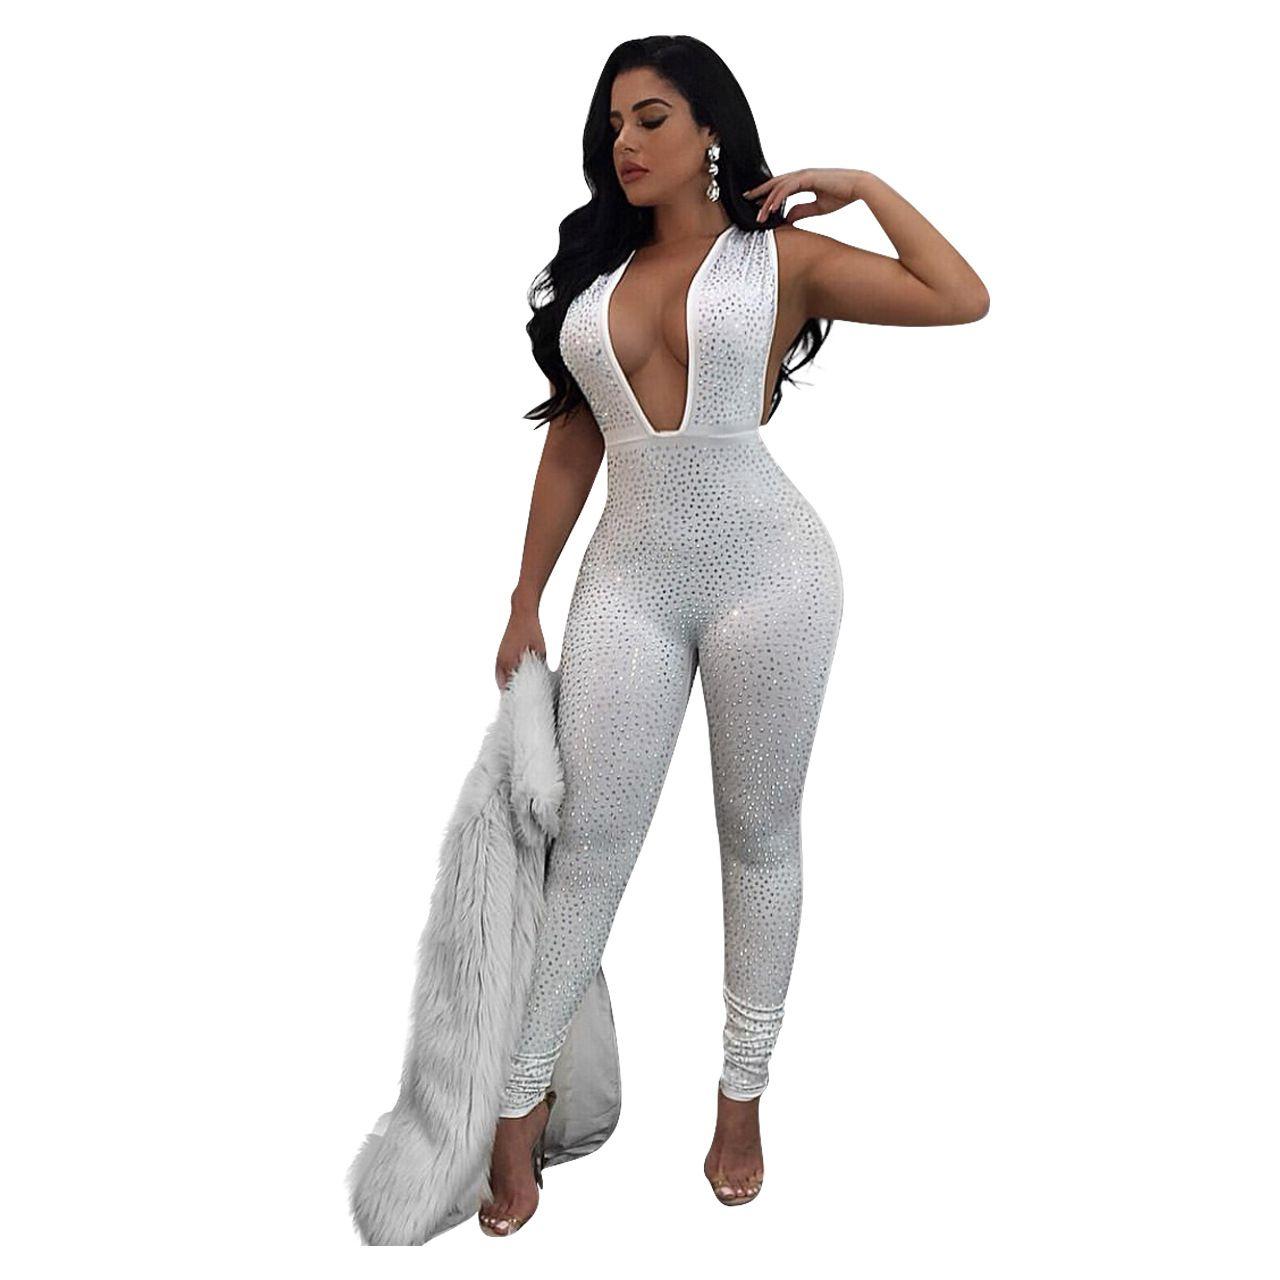 Overalls For Women Rhinestone Bodysuit Deep v Neck Top drill jumpsuits Glitter Onesie Sequin Bodysuit Body Feminino Catsuit